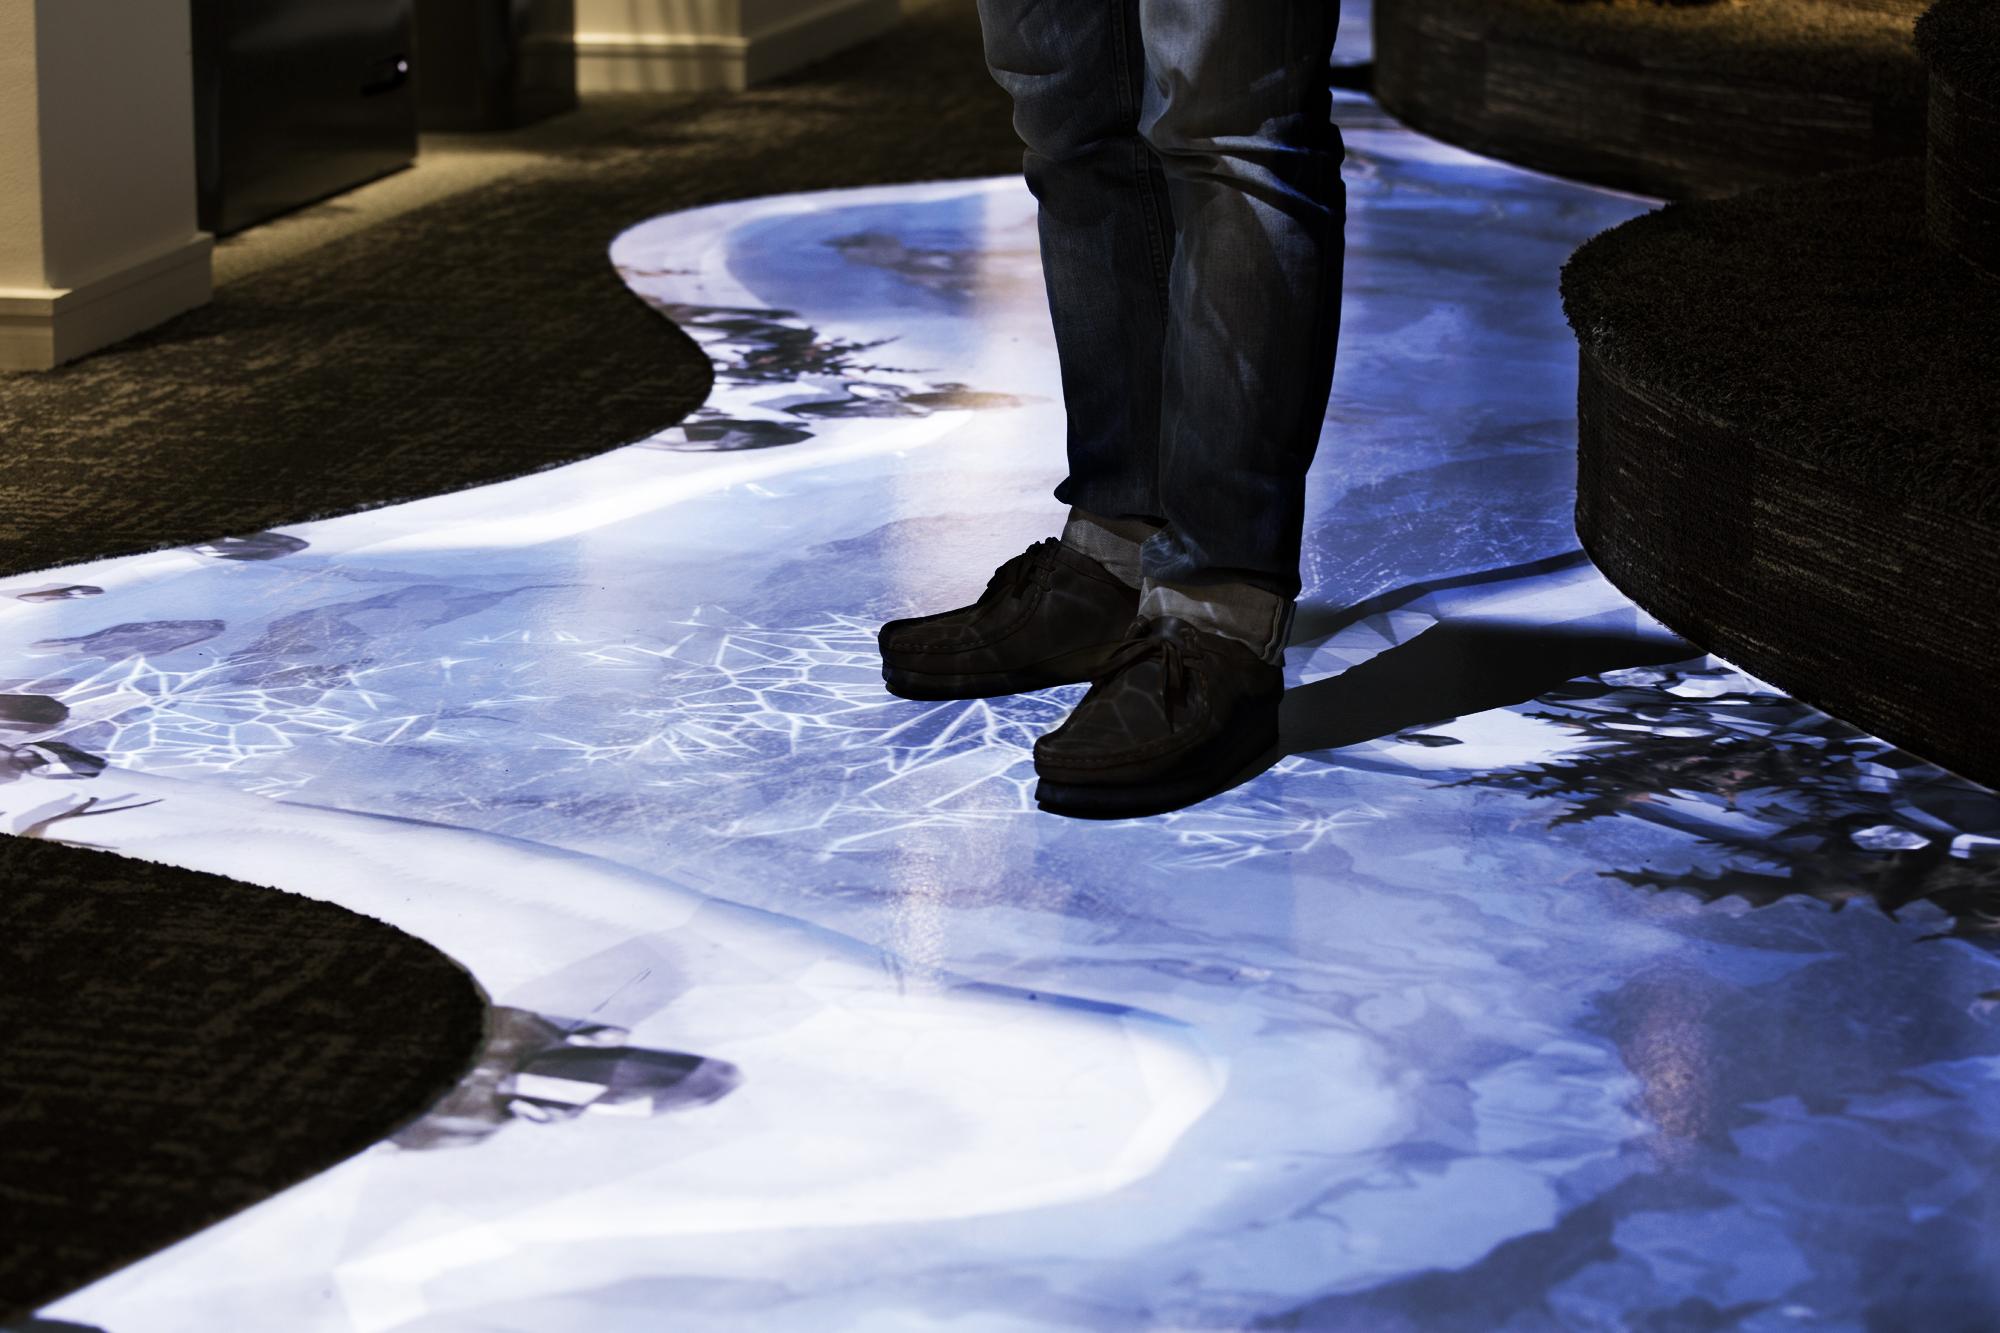 Dettaglio del pavimento interattivo (courtesy photo: Joachim Belaieff - / Adolfsson & Partners)